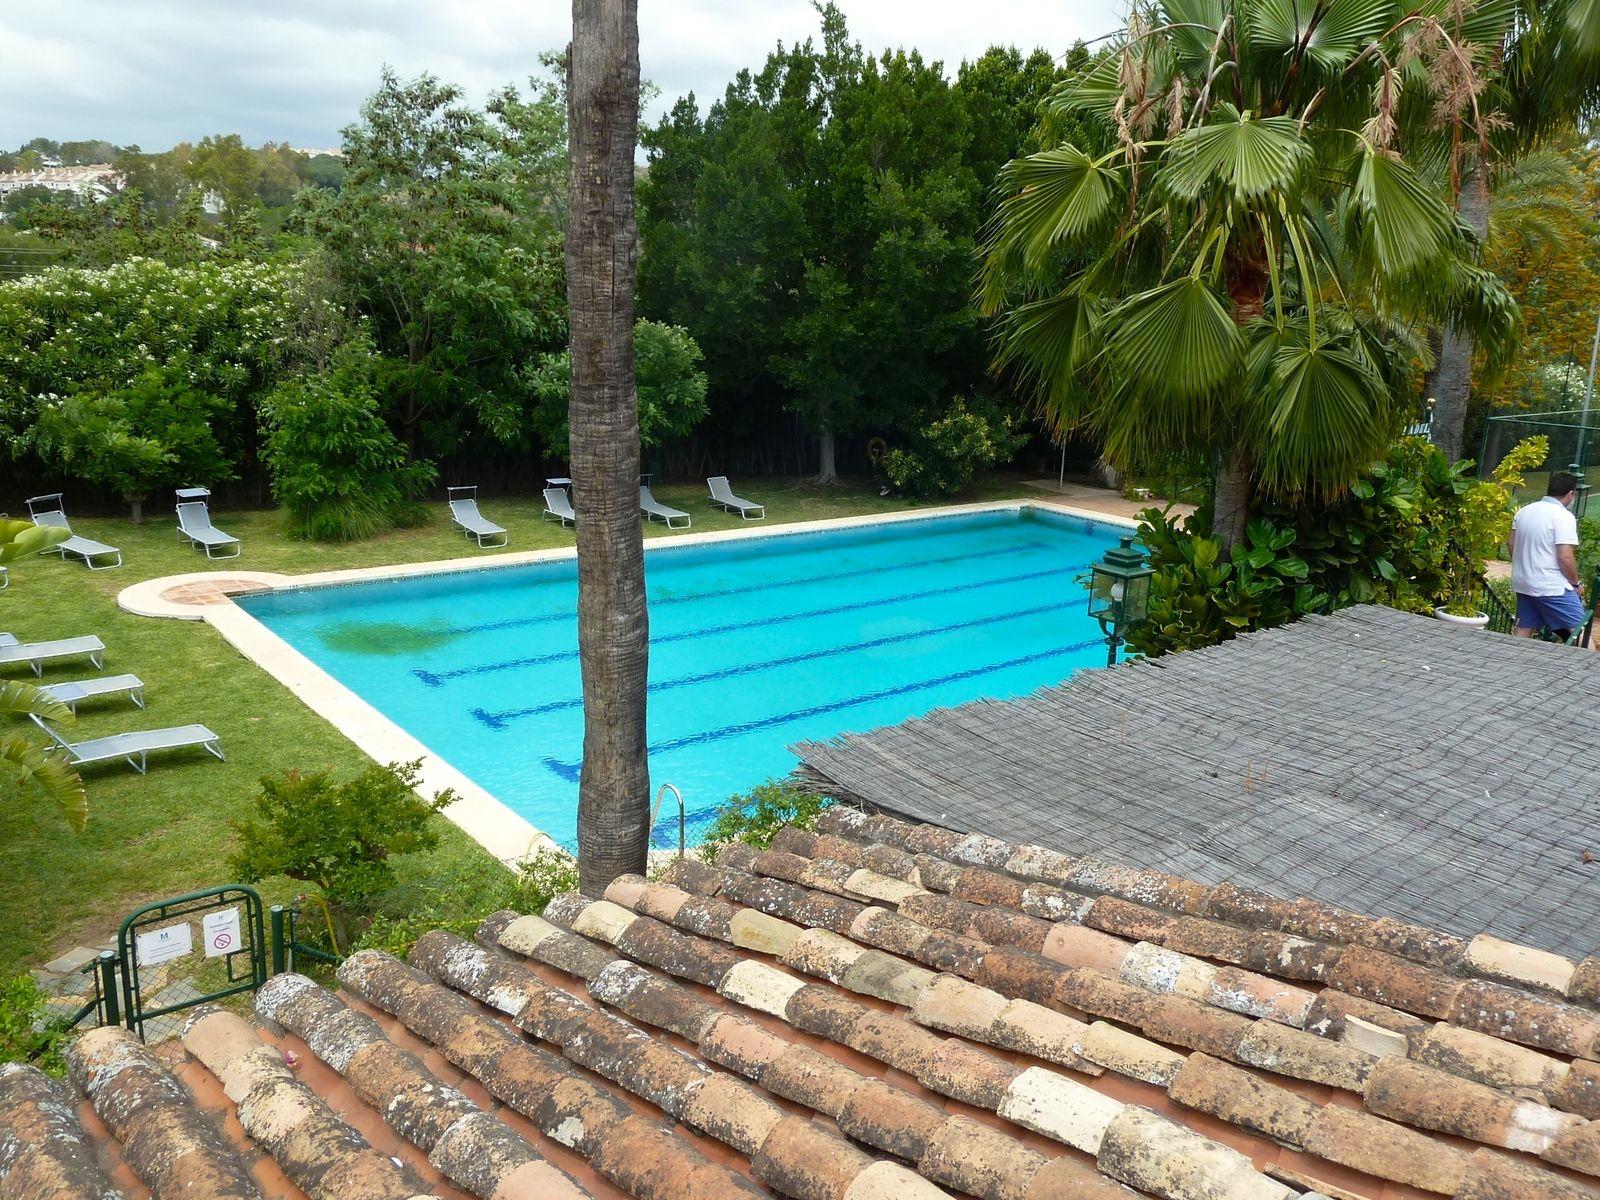 tennis-tourist-Manolo-Santana-Racquet-Club-Marbella-pool-from-above-teri-church